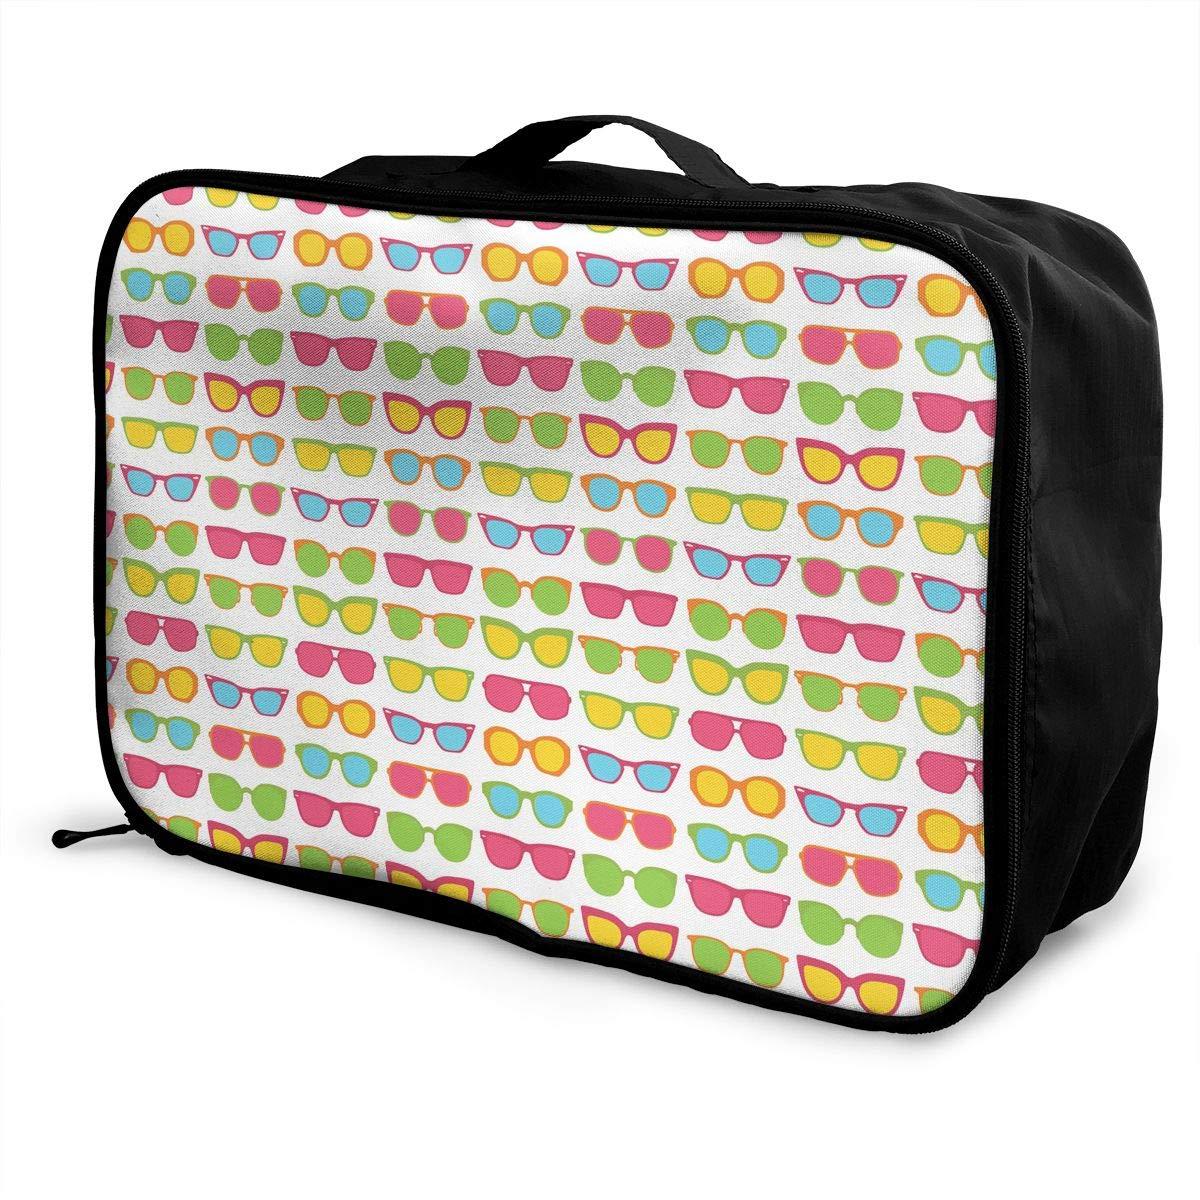 Travel Luggage Duffle Bag Lightweight Portable Handbag Sunglasses Pattern Large Capacity Waterproof Foldable Storage Tote